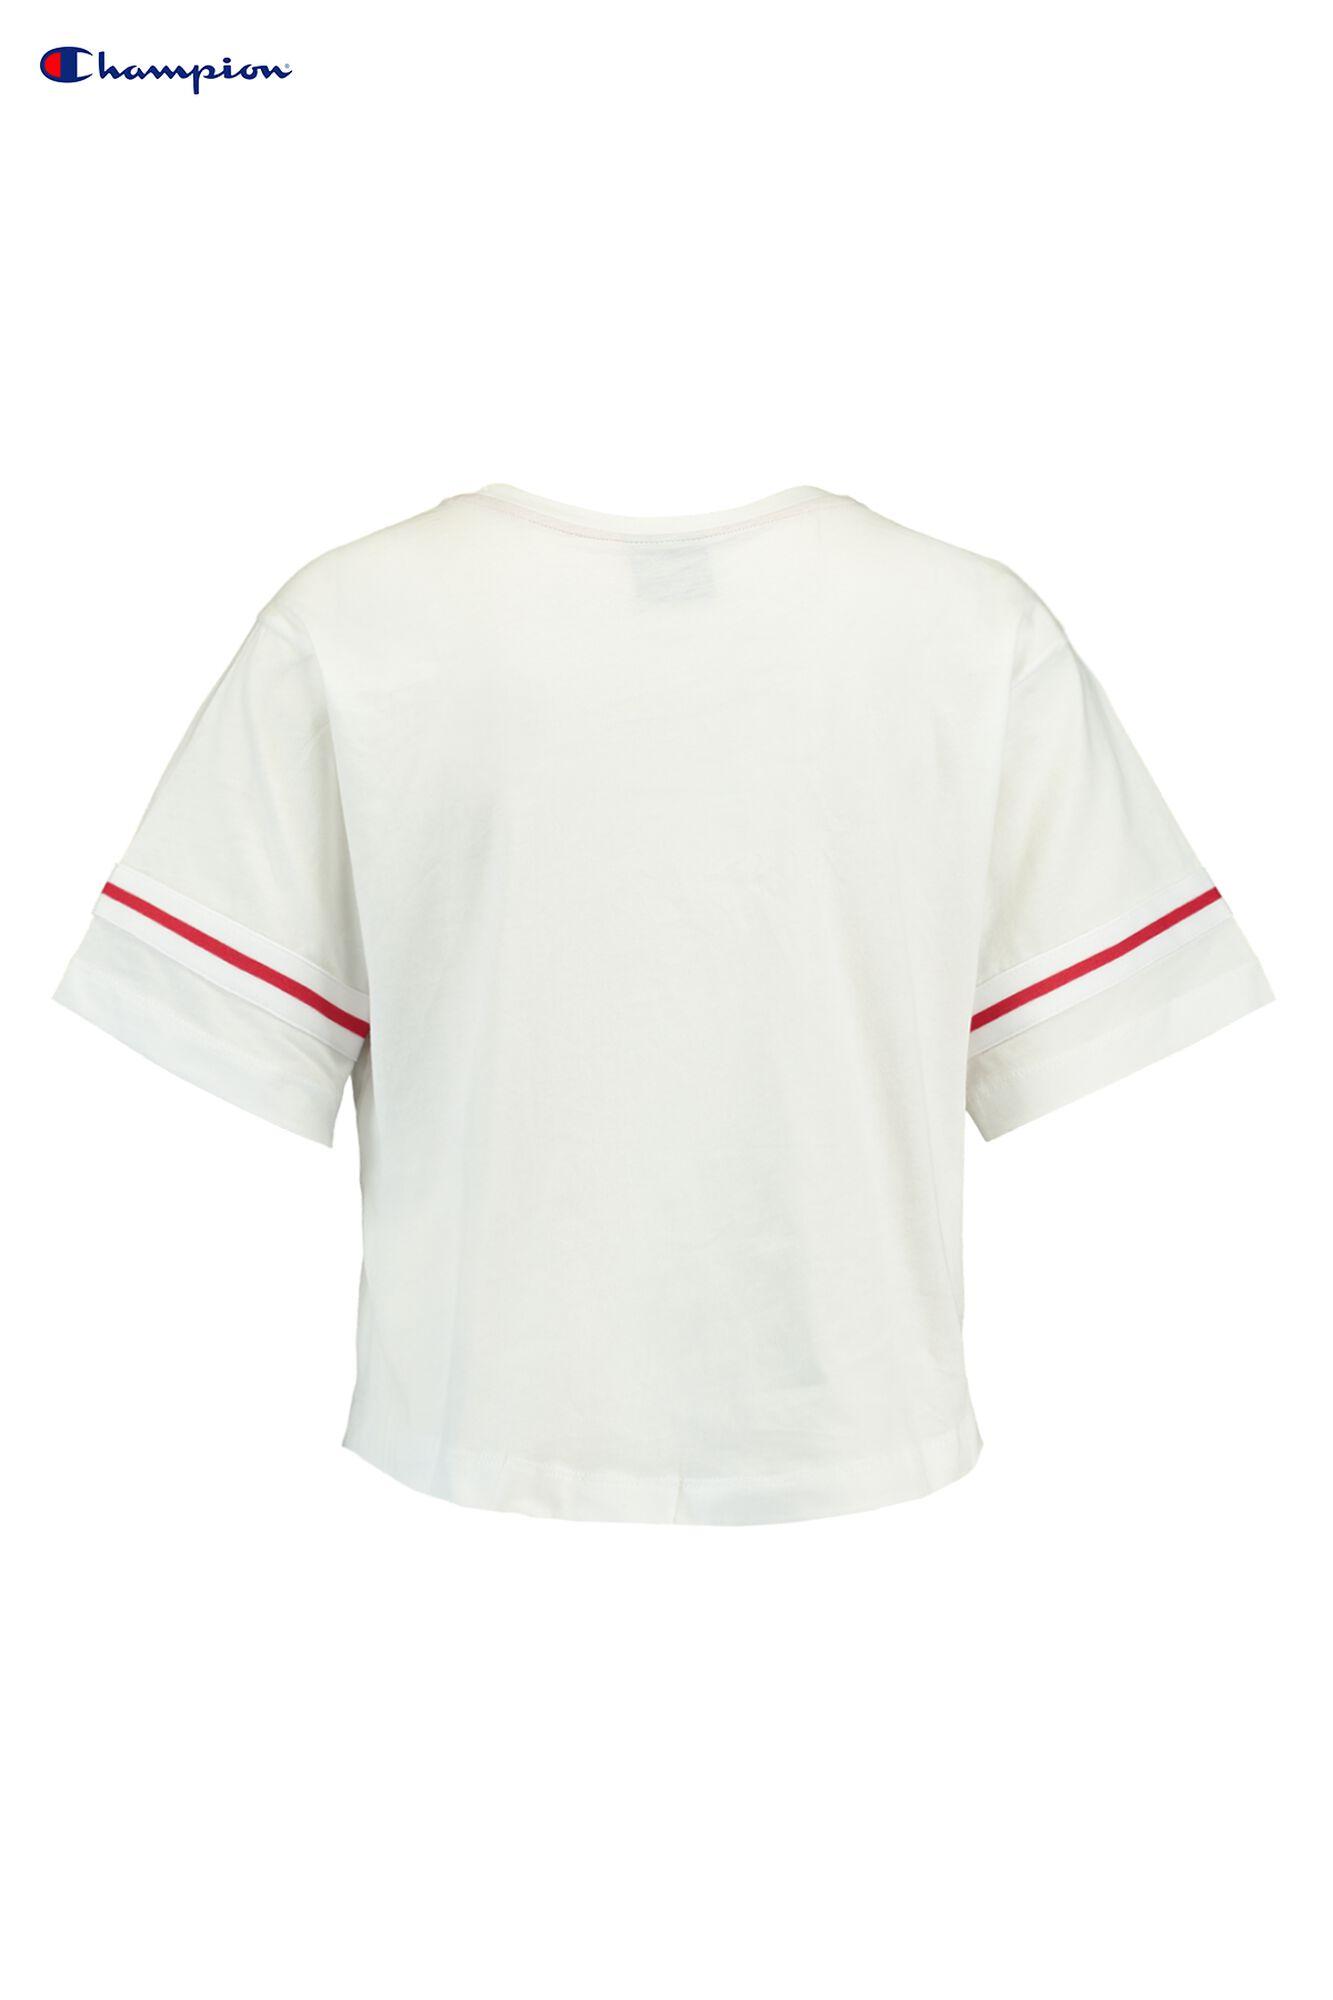 d1956bfac Women T-shirt Champion Manifesto White Buy Online